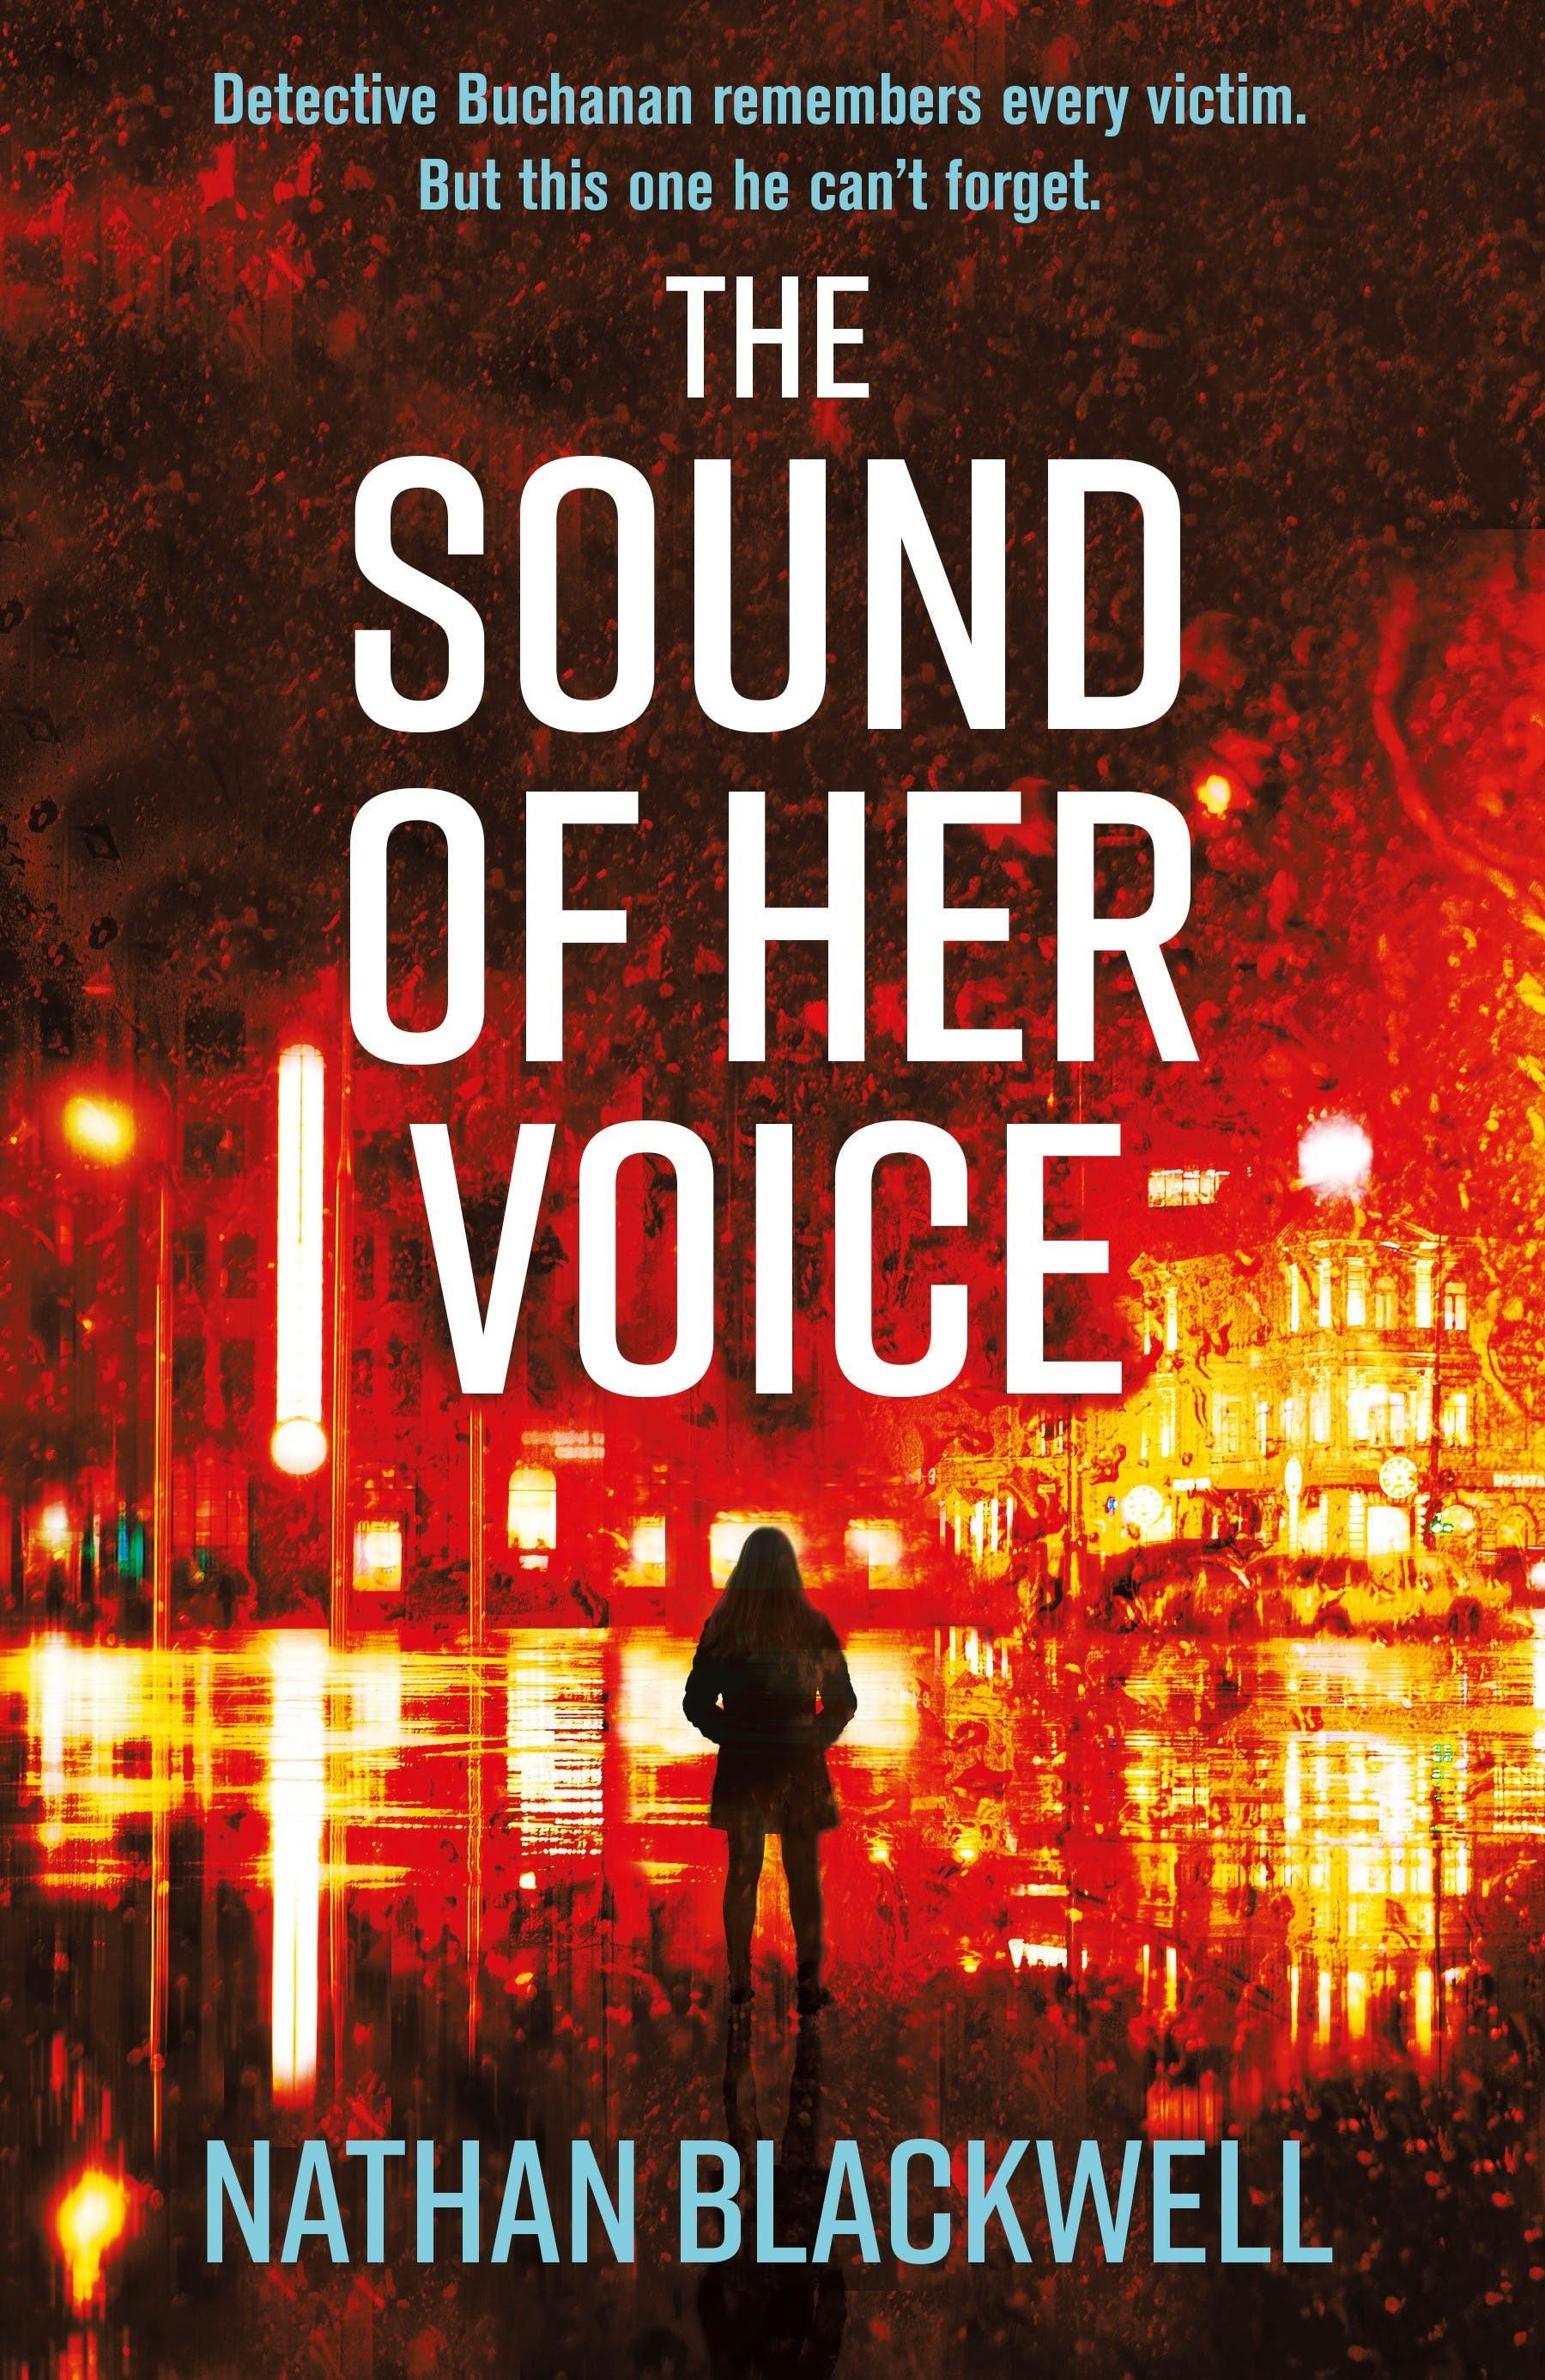 The Sound ofHerVoice